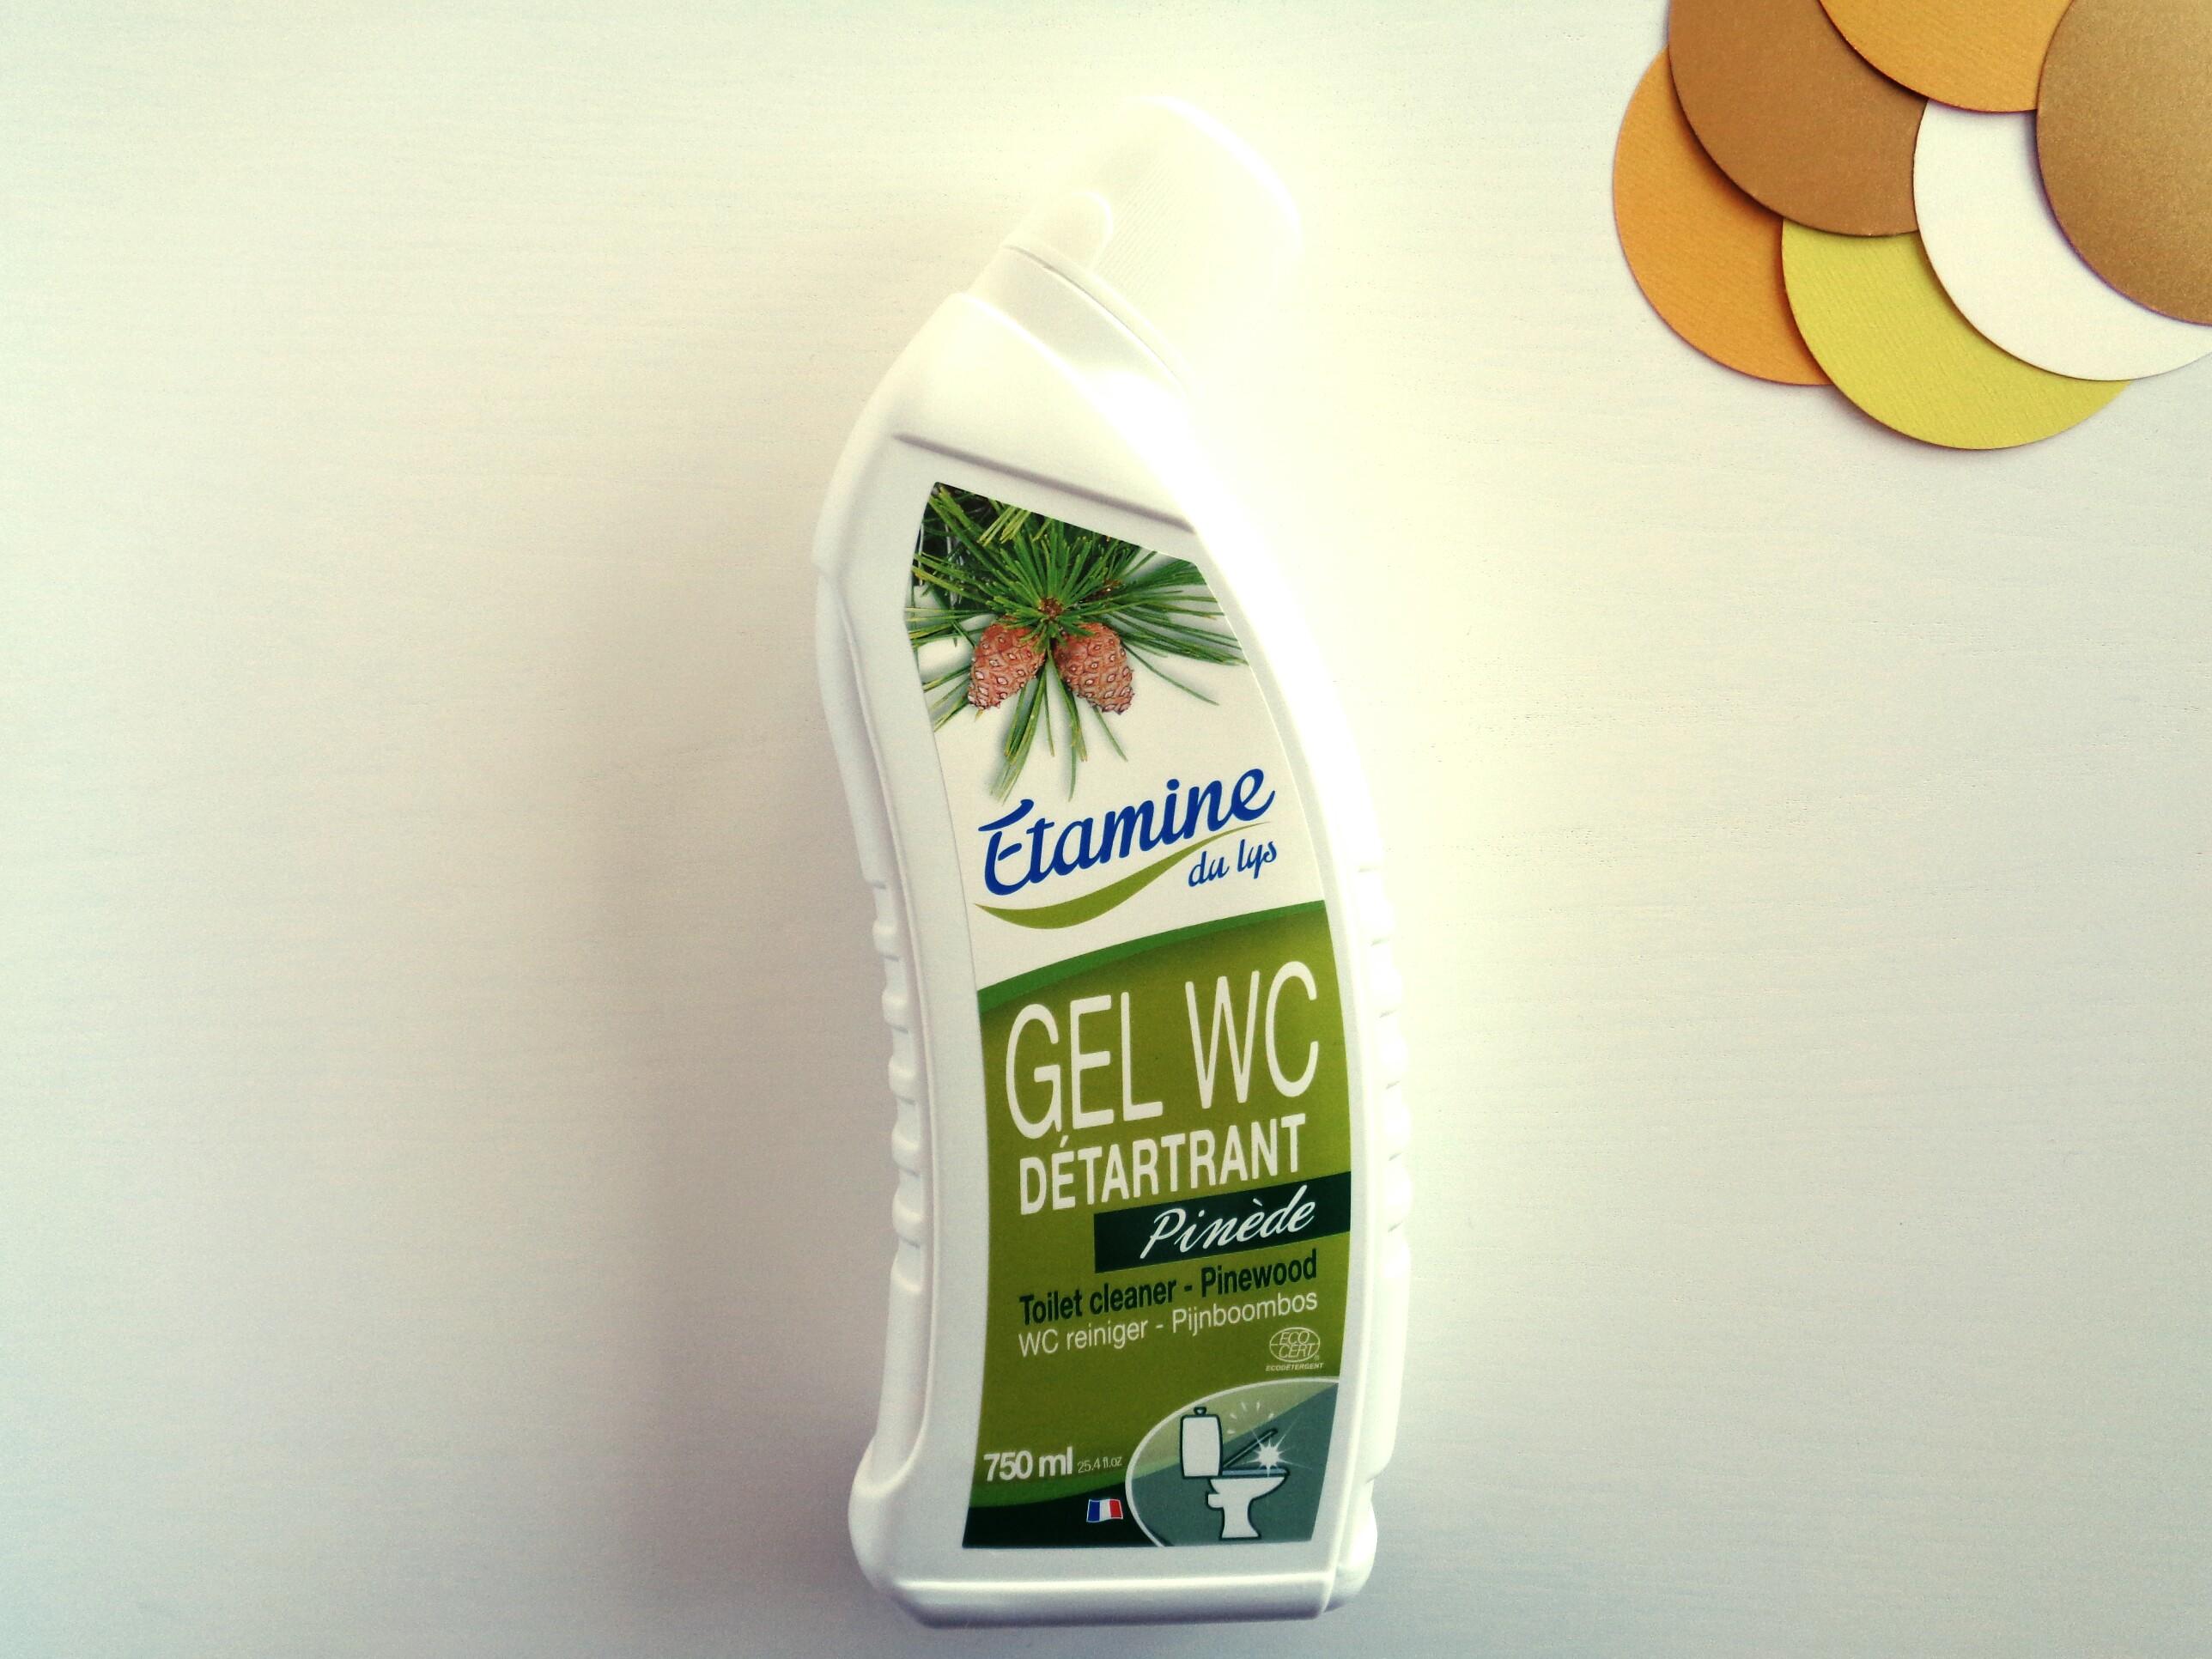 Etamine du Lys – Gel WC pinède (750ml)